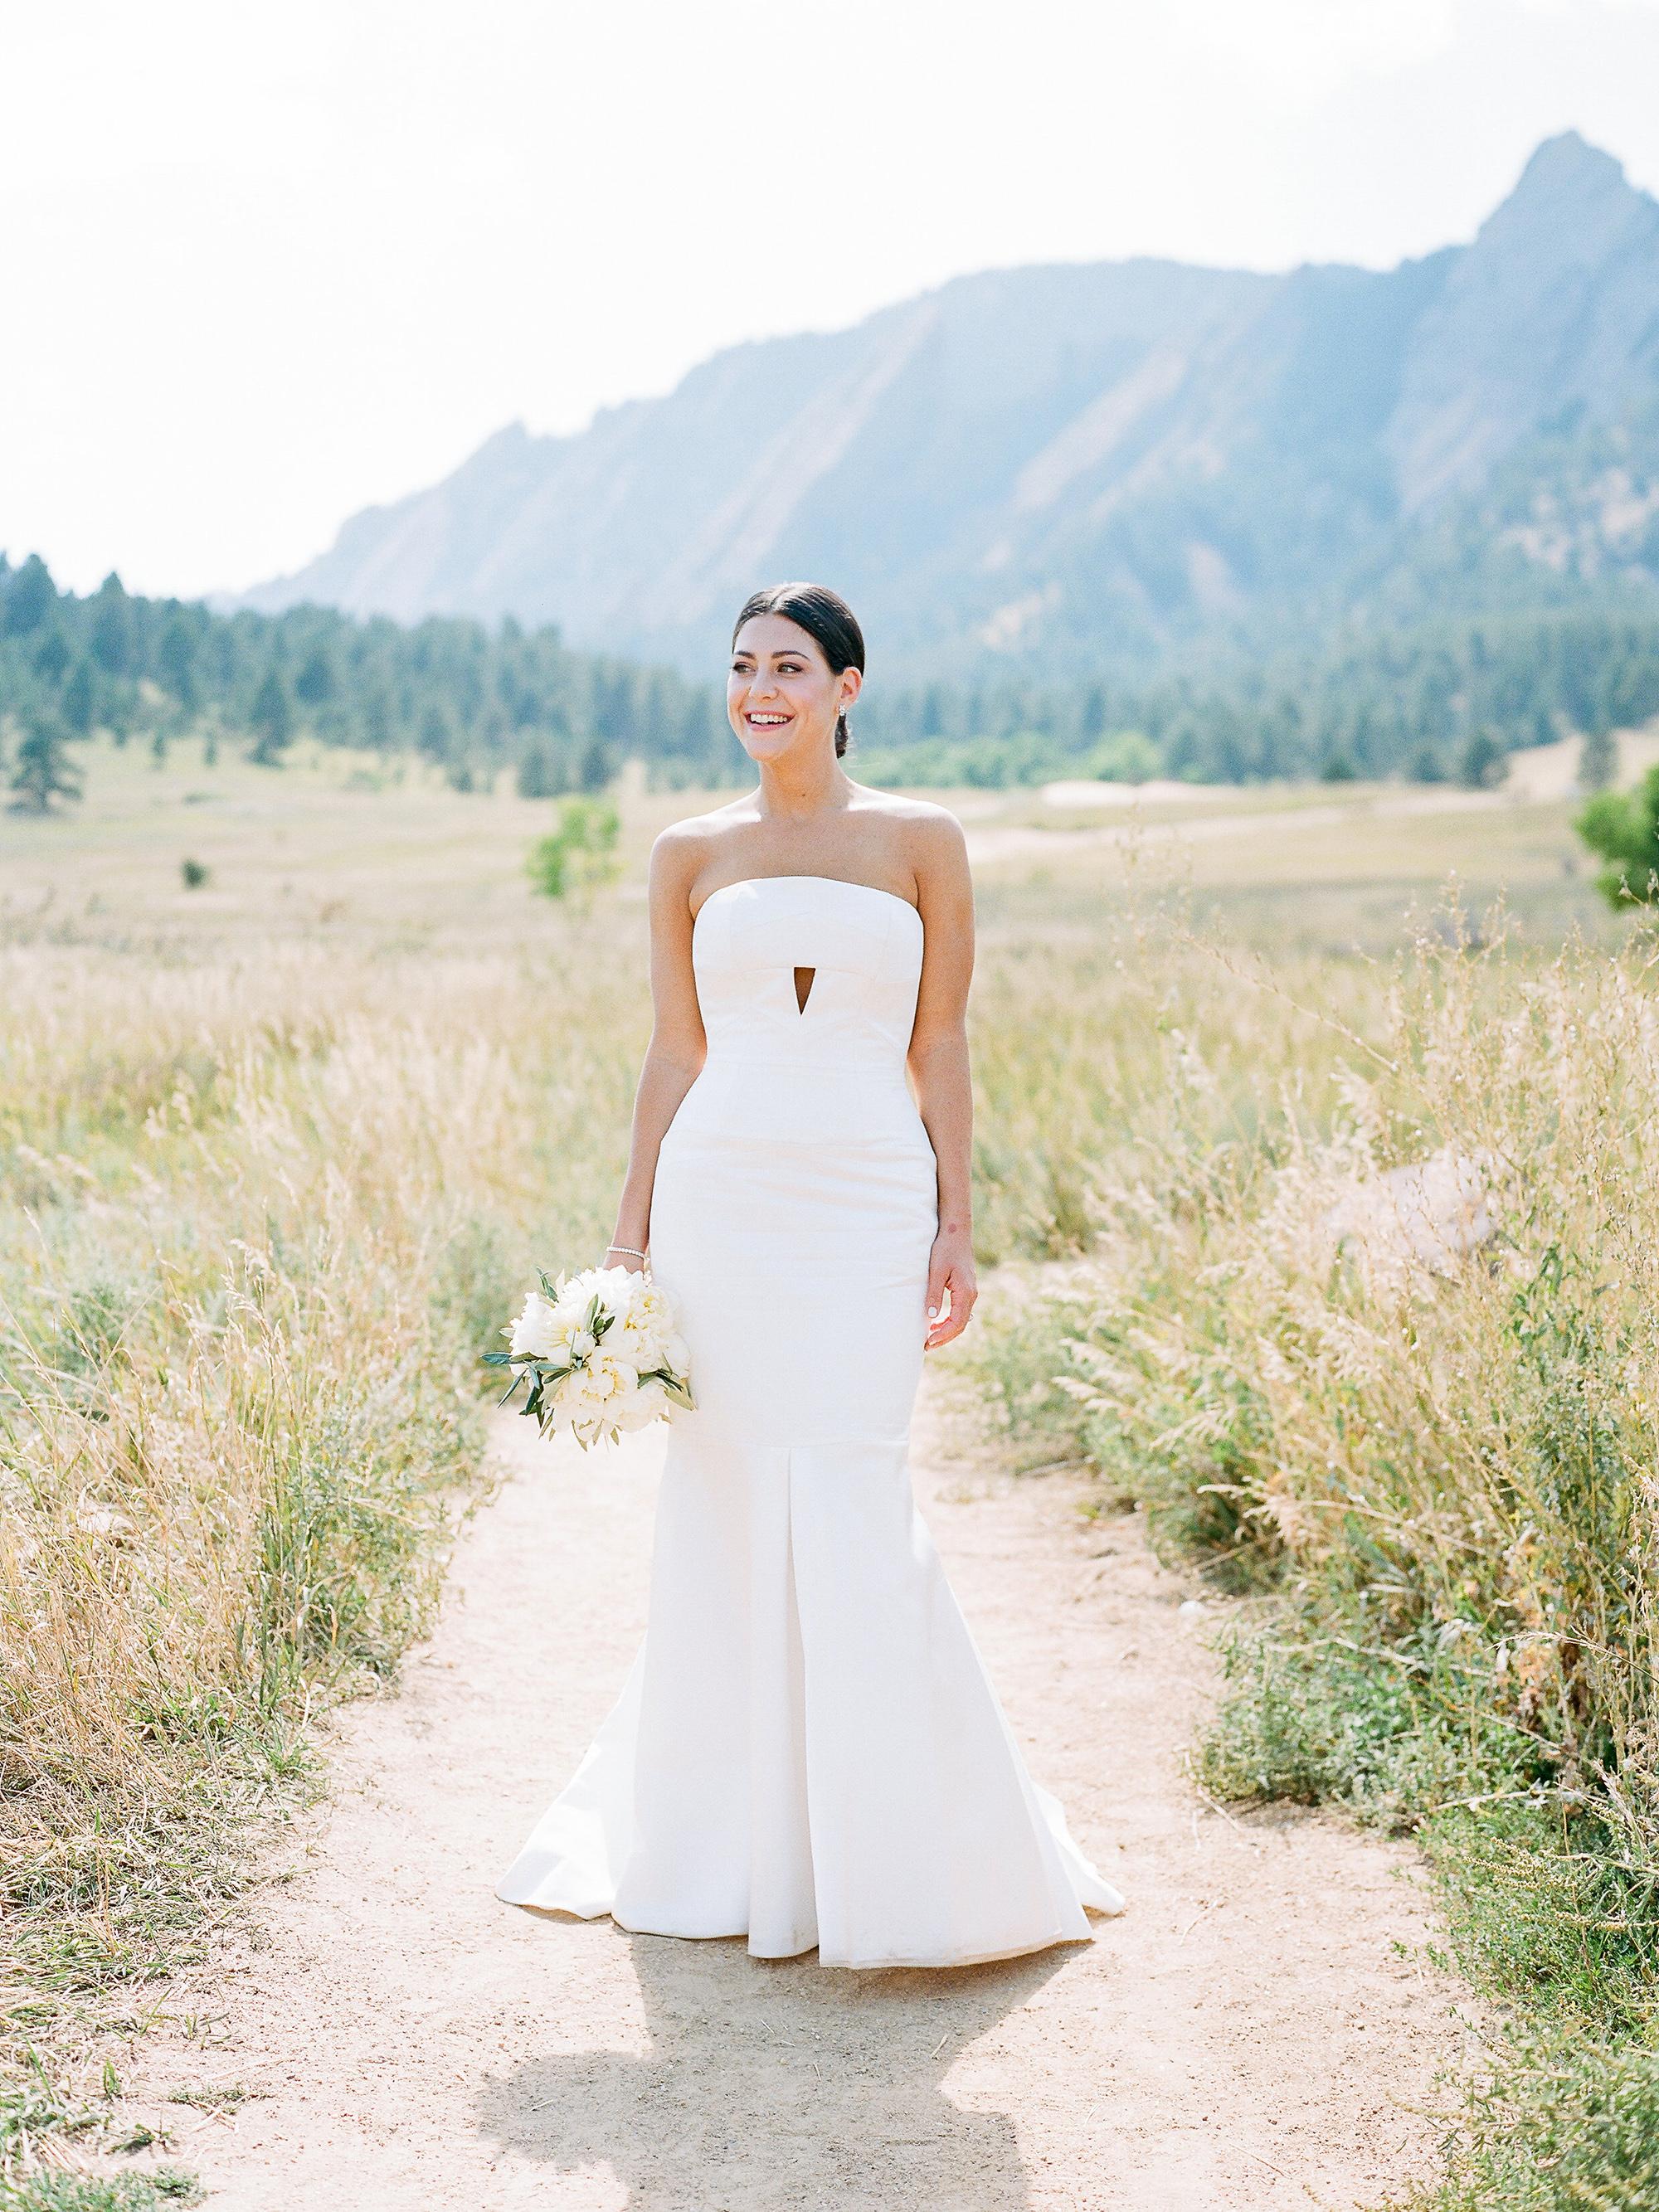 best wedding dresses 2018 jamie john simple white with peep hole